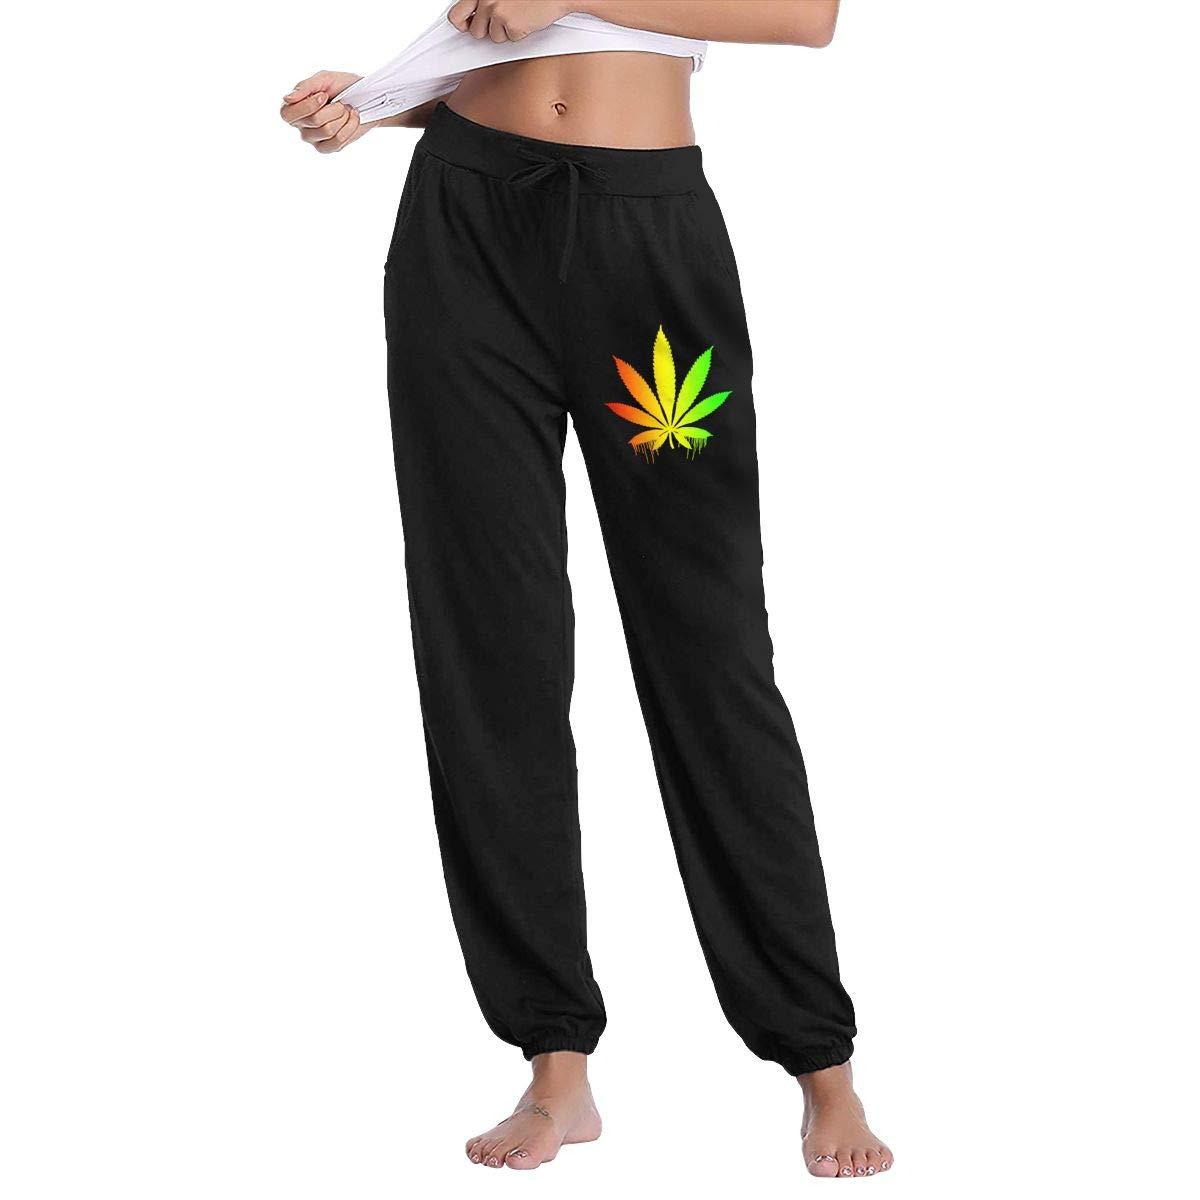 Rasta Pot Leaf Marijuana Dripping Women's Sweatpants Jogger Pants with Pockets